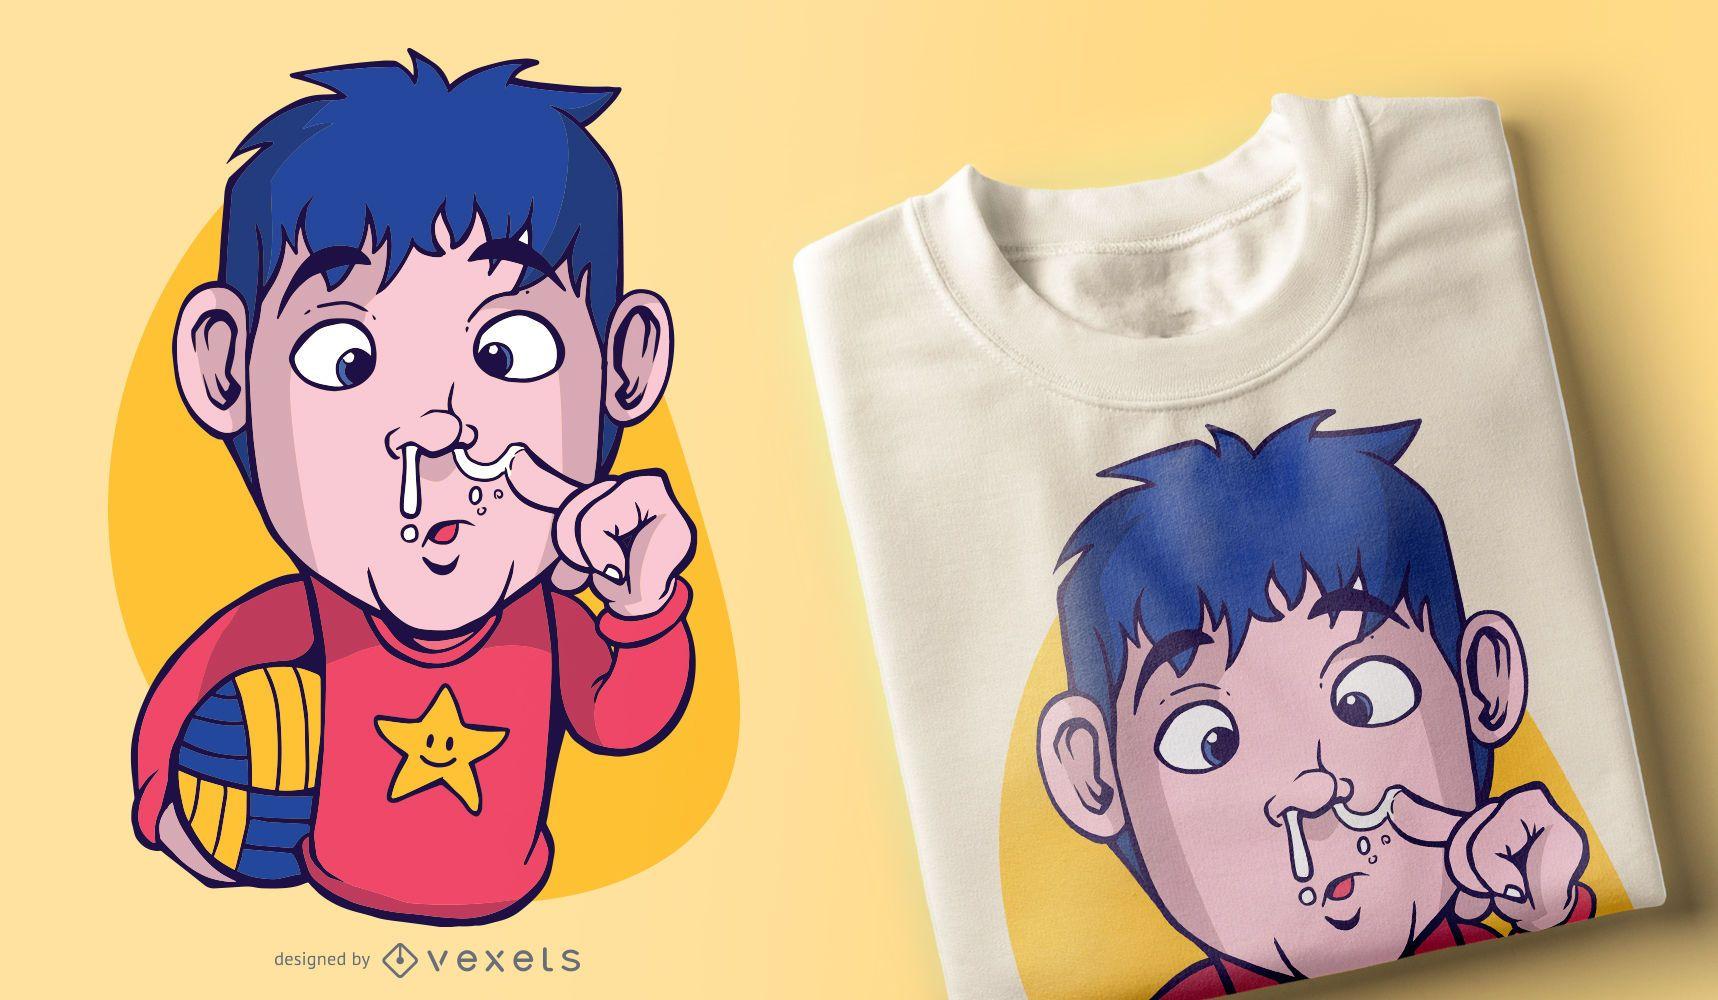 Snotty Nose Kid T-shirt Design